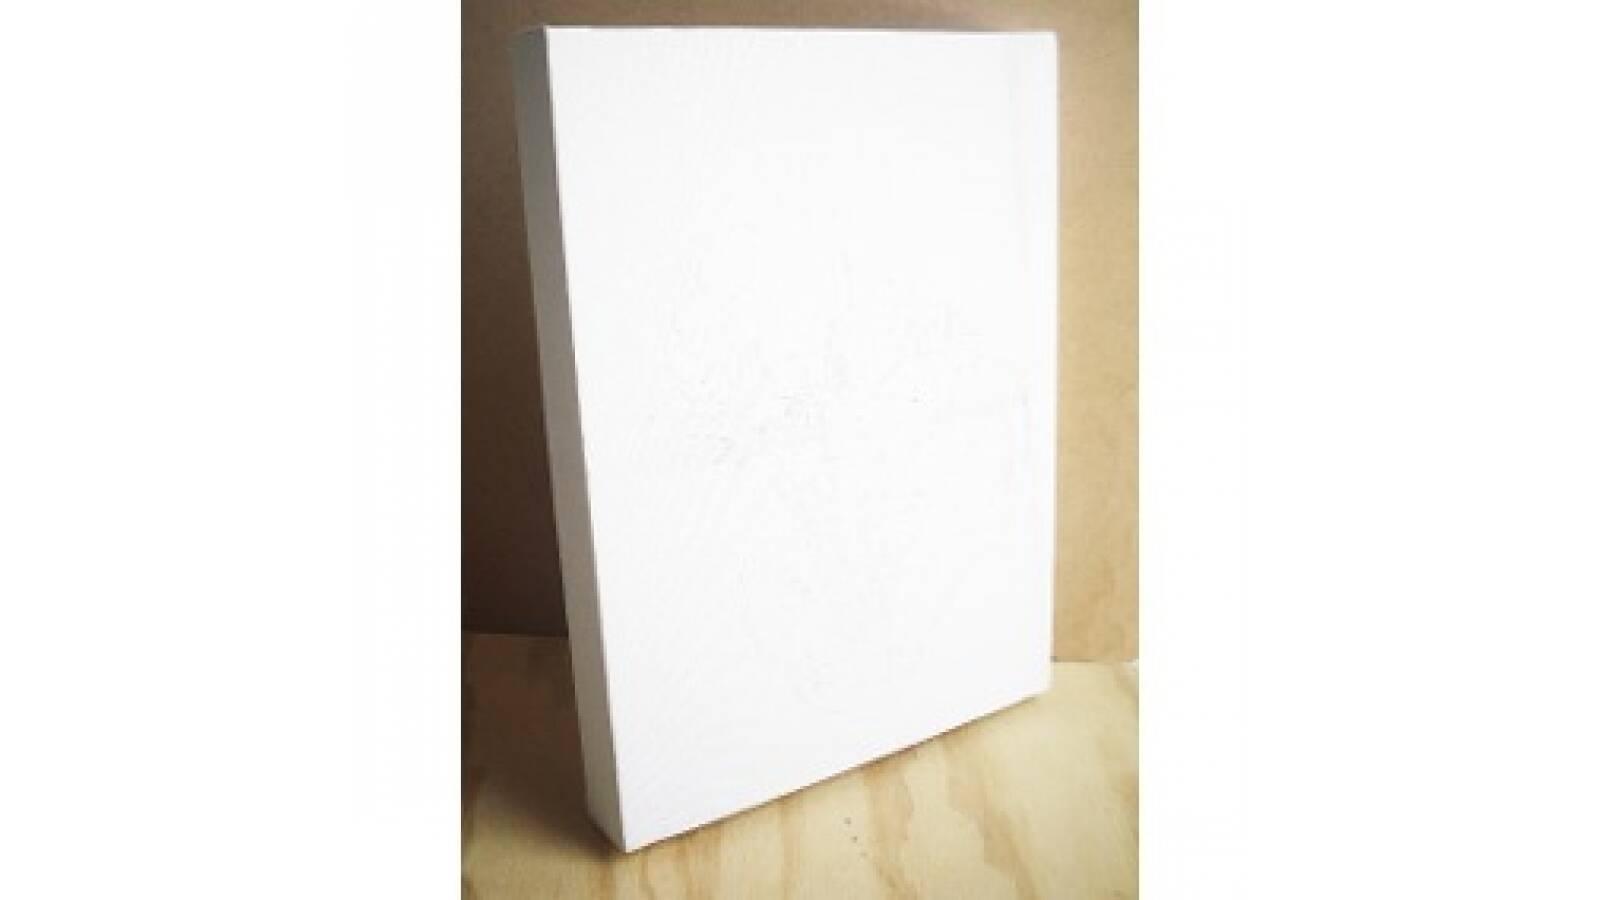 Lienzo cuadro blanco con bastidores canvas 50 x 60 cm